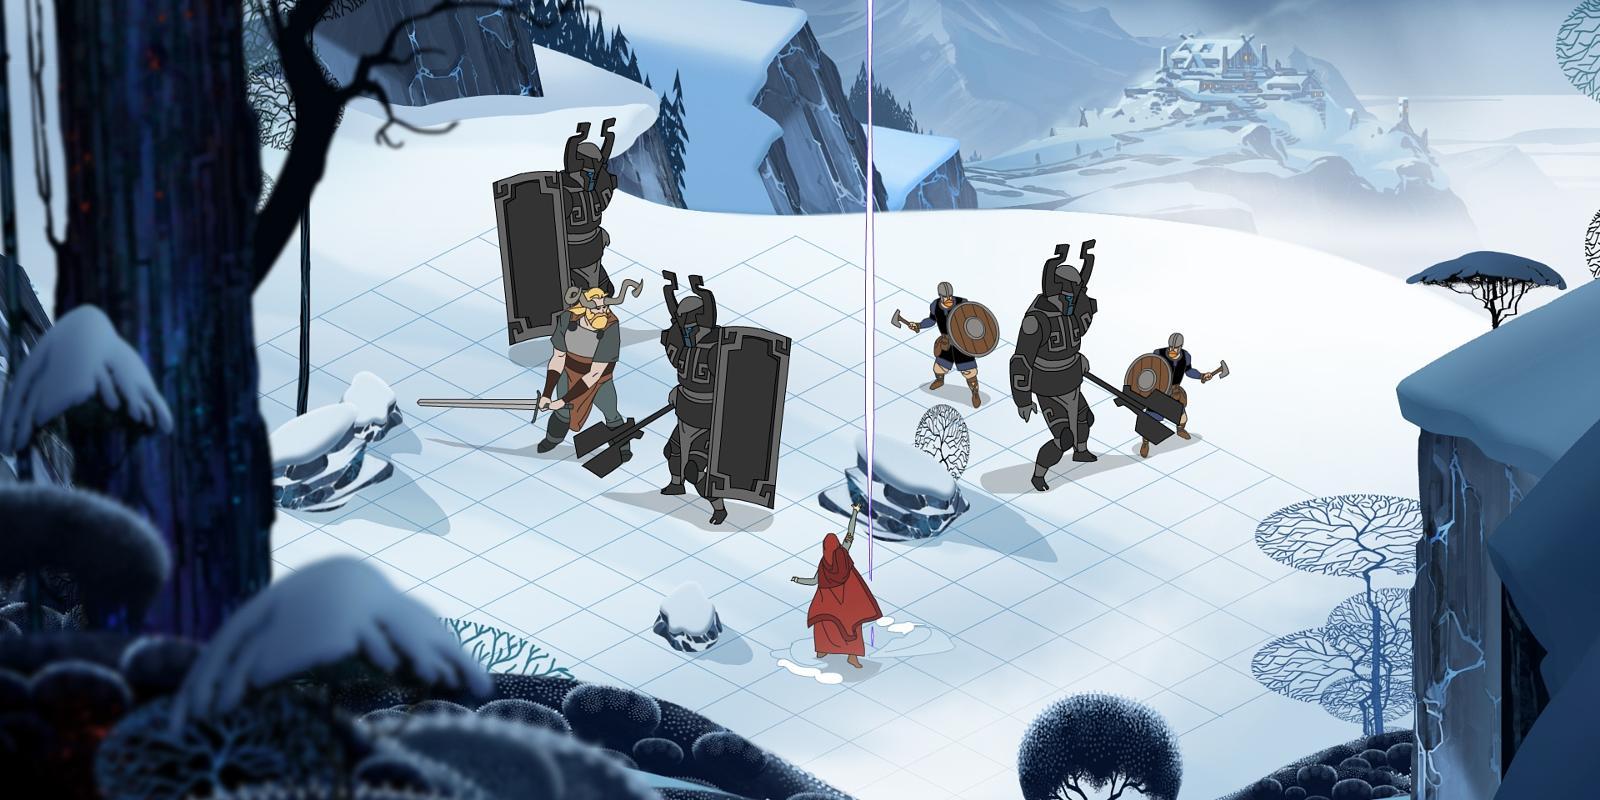 landscape_gaming-the-banner-saga.jpg